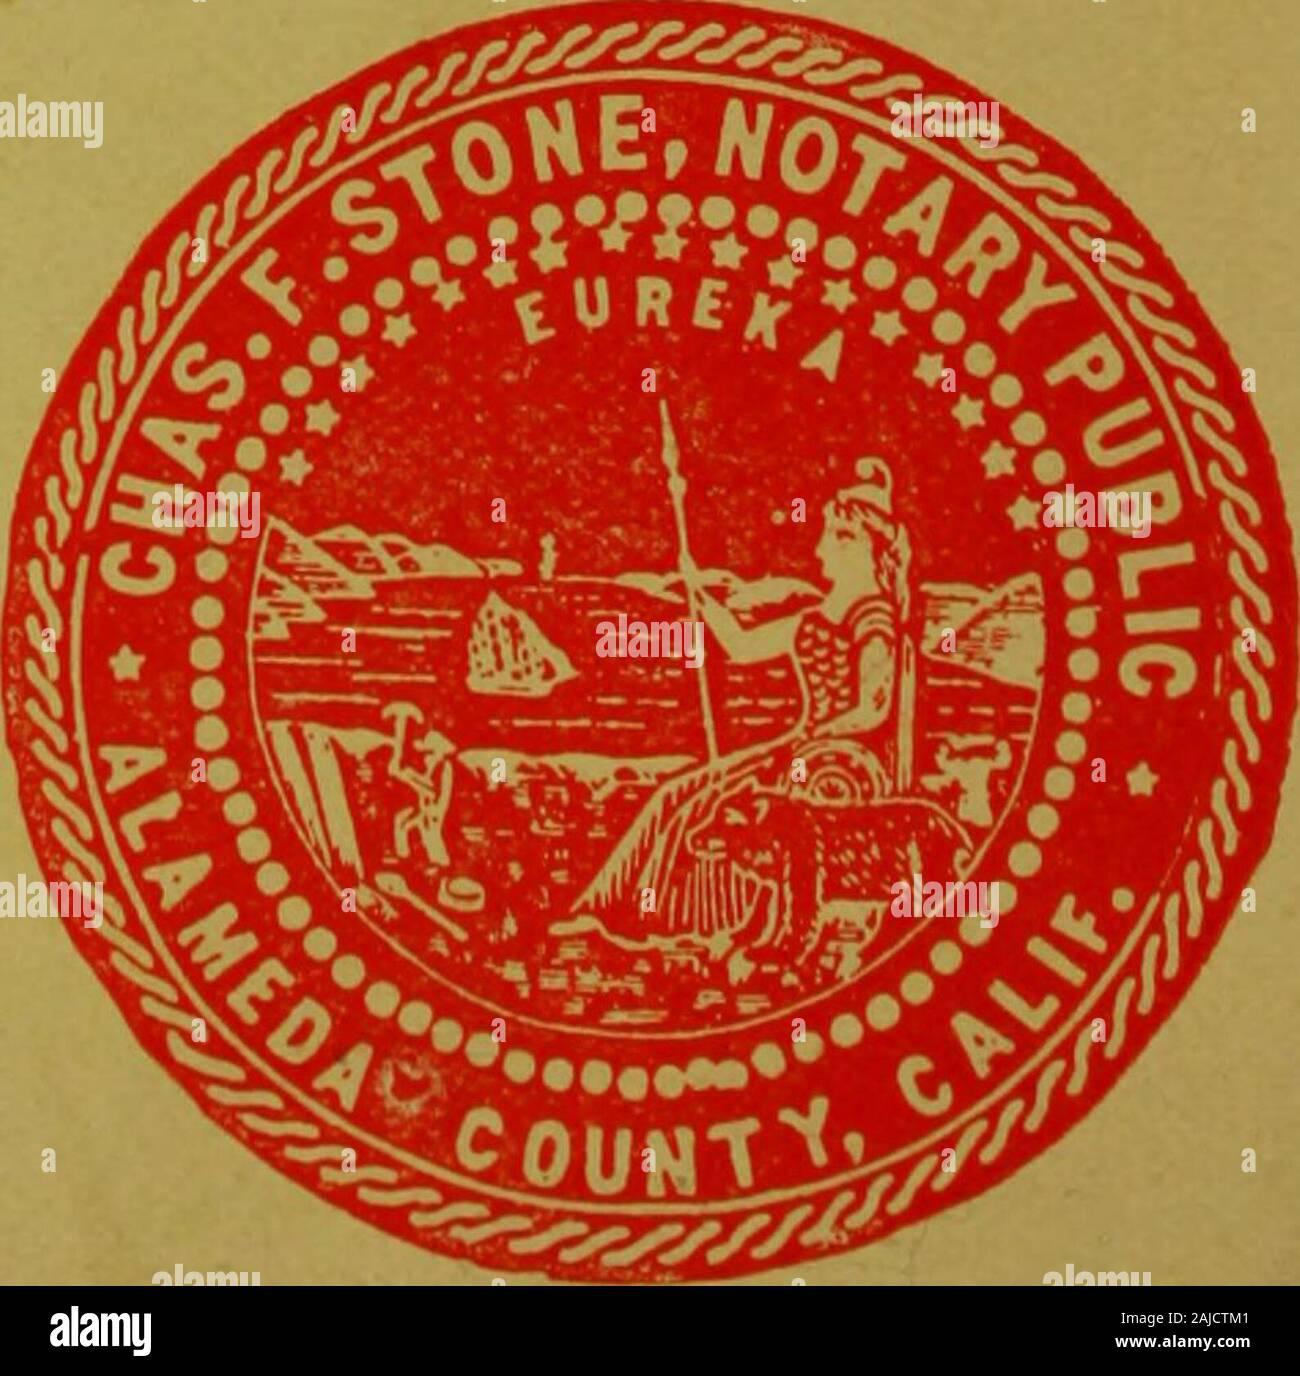 Polk-Husted Directory Co.'s Oakland, Berkeley and Alameda directory . OAKLANDSOPTICALCENTER Stock Photo